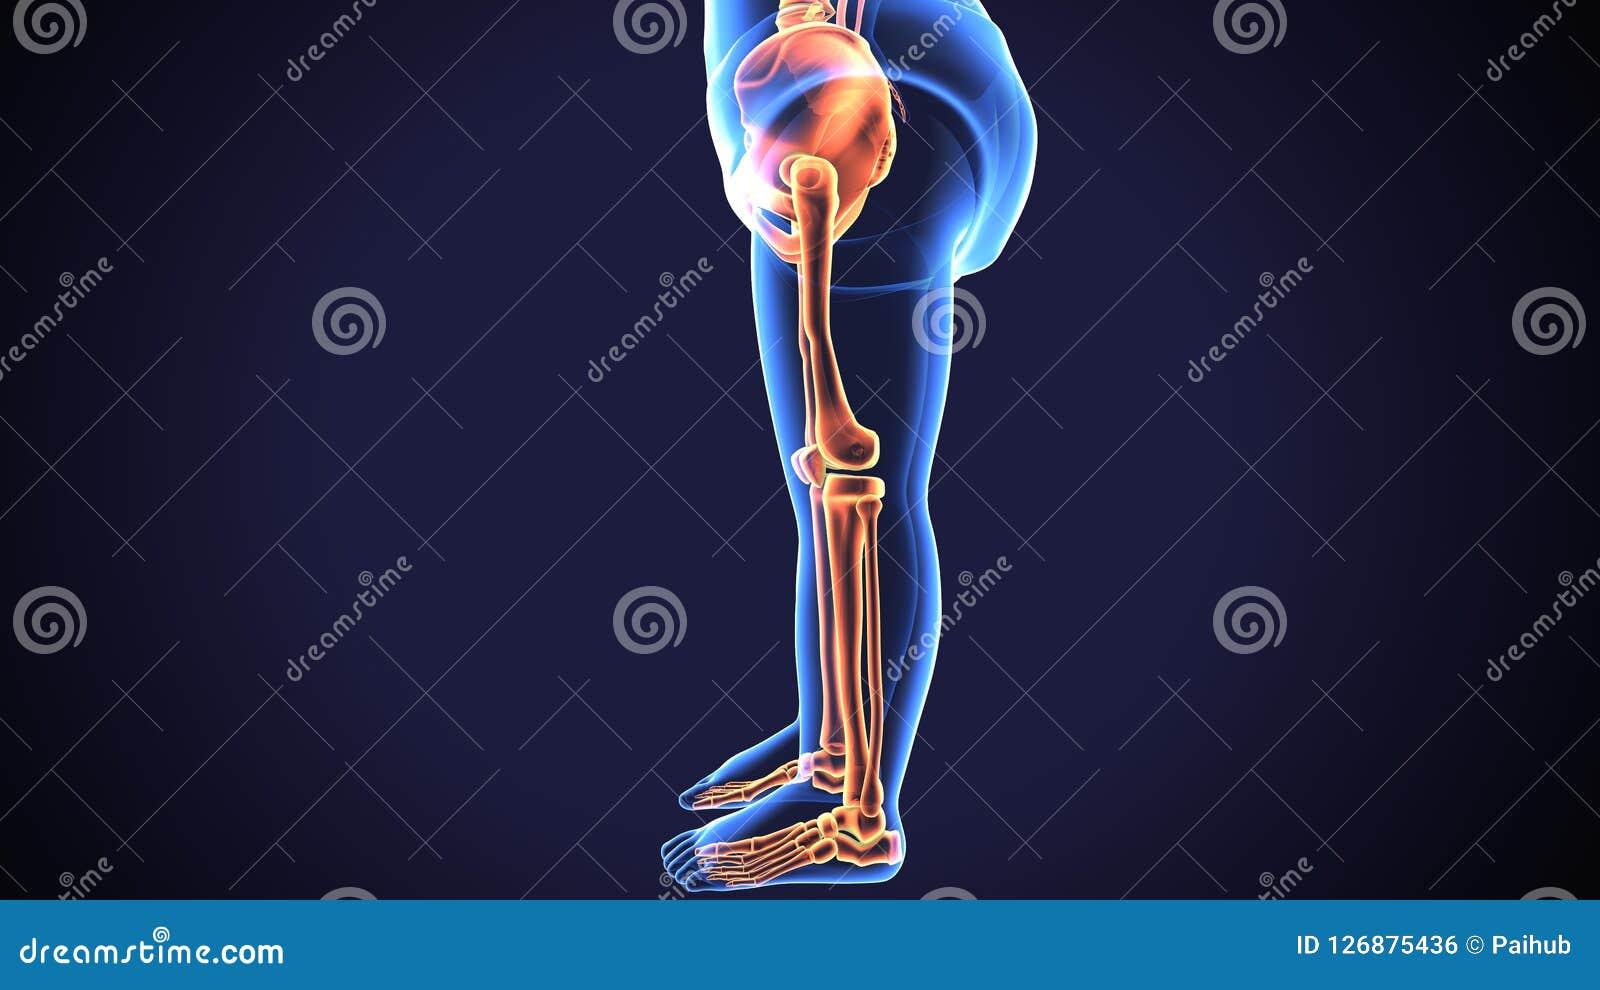 3d Render Of Human Skeleton Lower Leg Pain Anatomy Stock